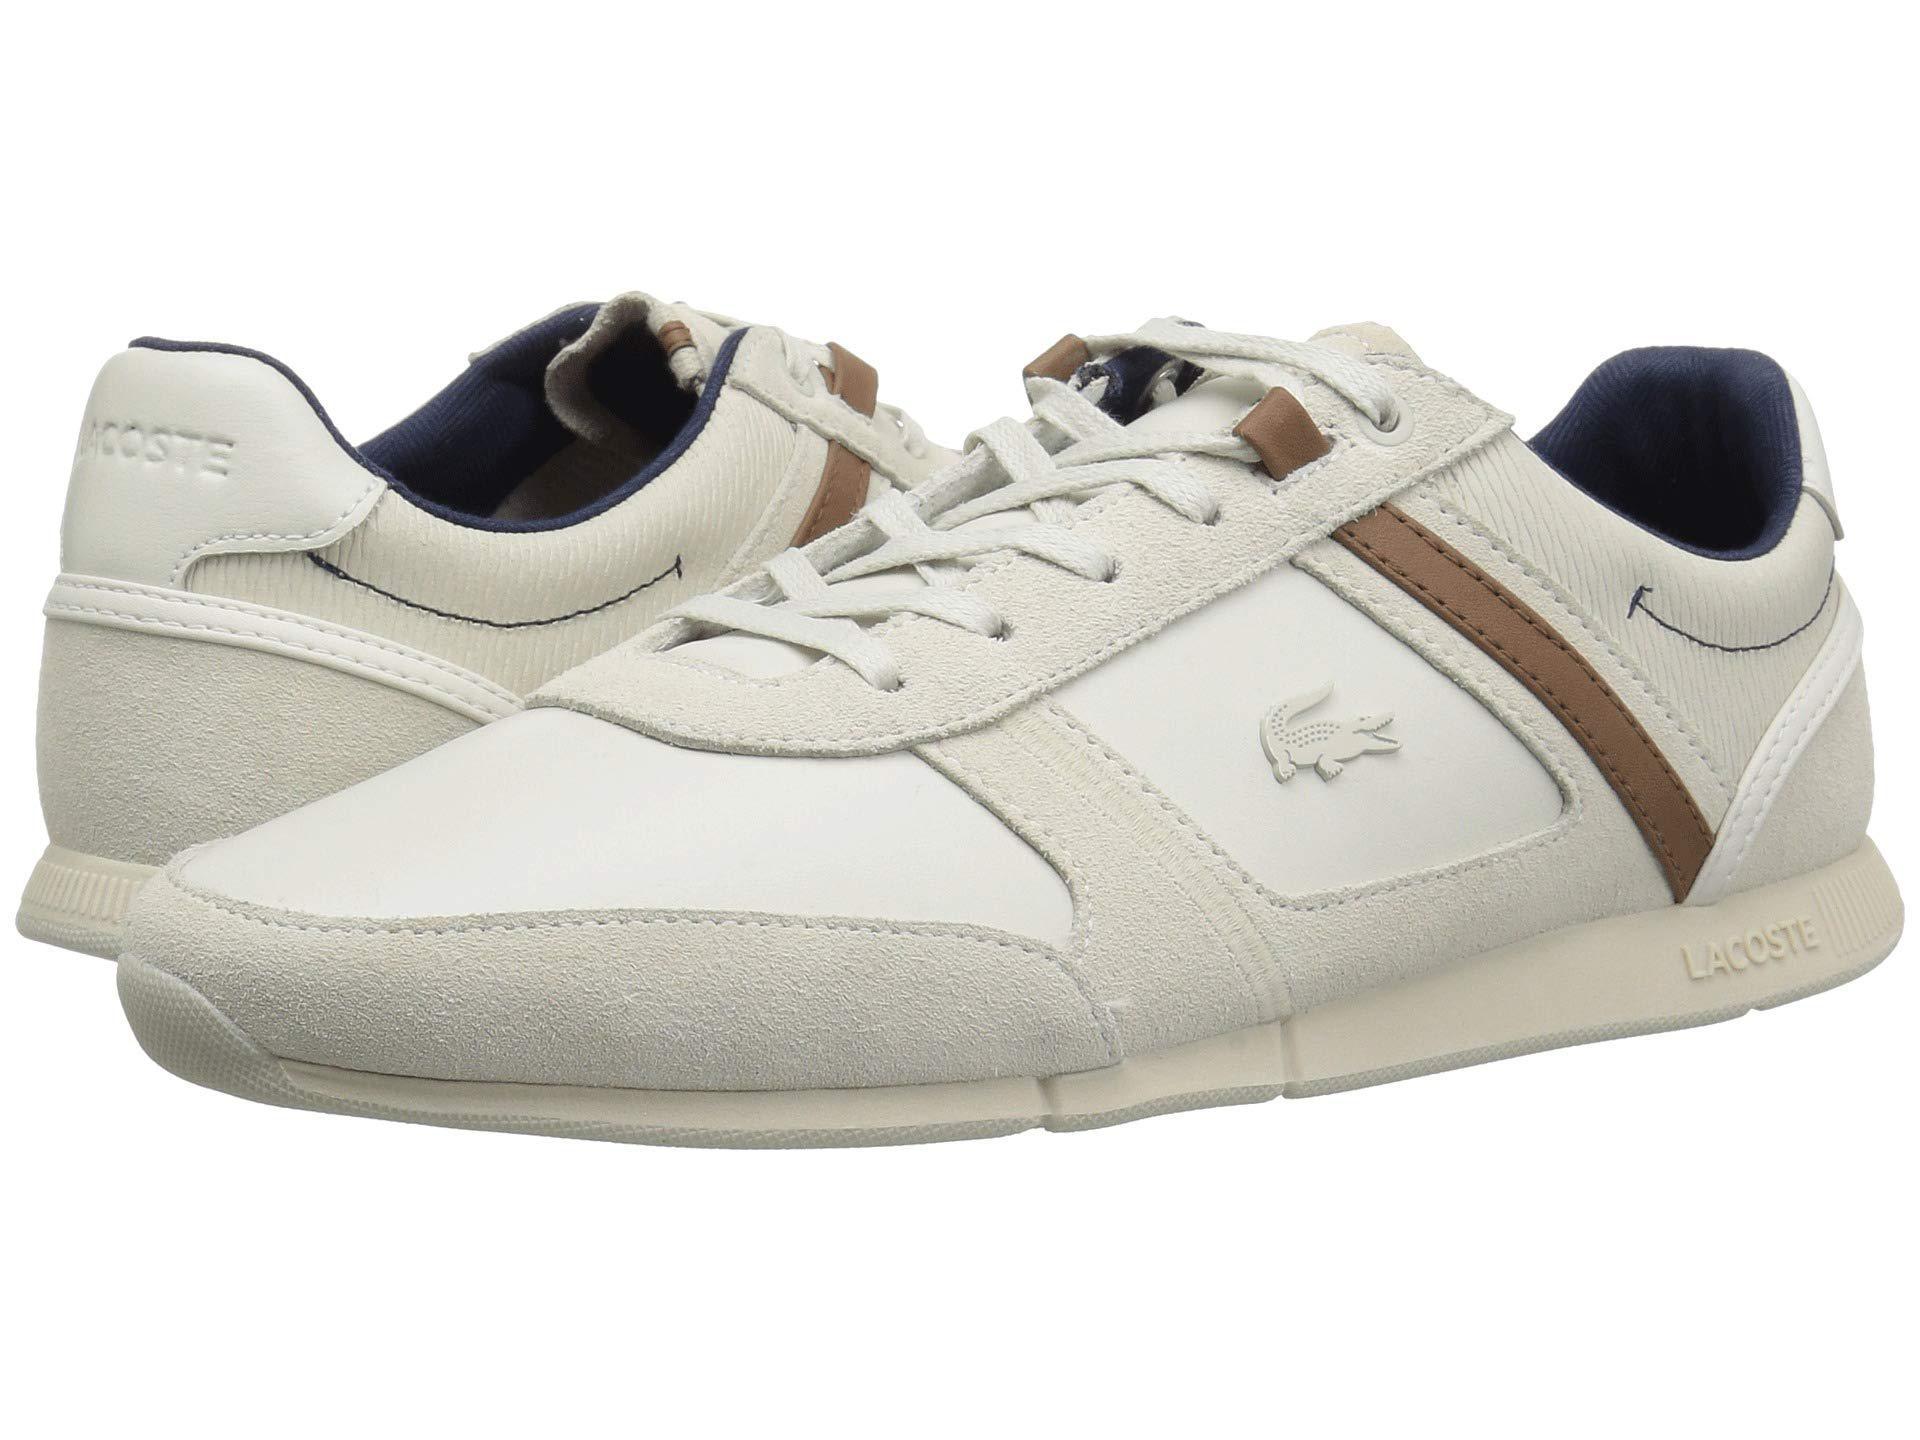 3efebe54bd53e Lyst - Lacoste Menerva 318 1 (navy brown) Men s Shoes in Brown for Men